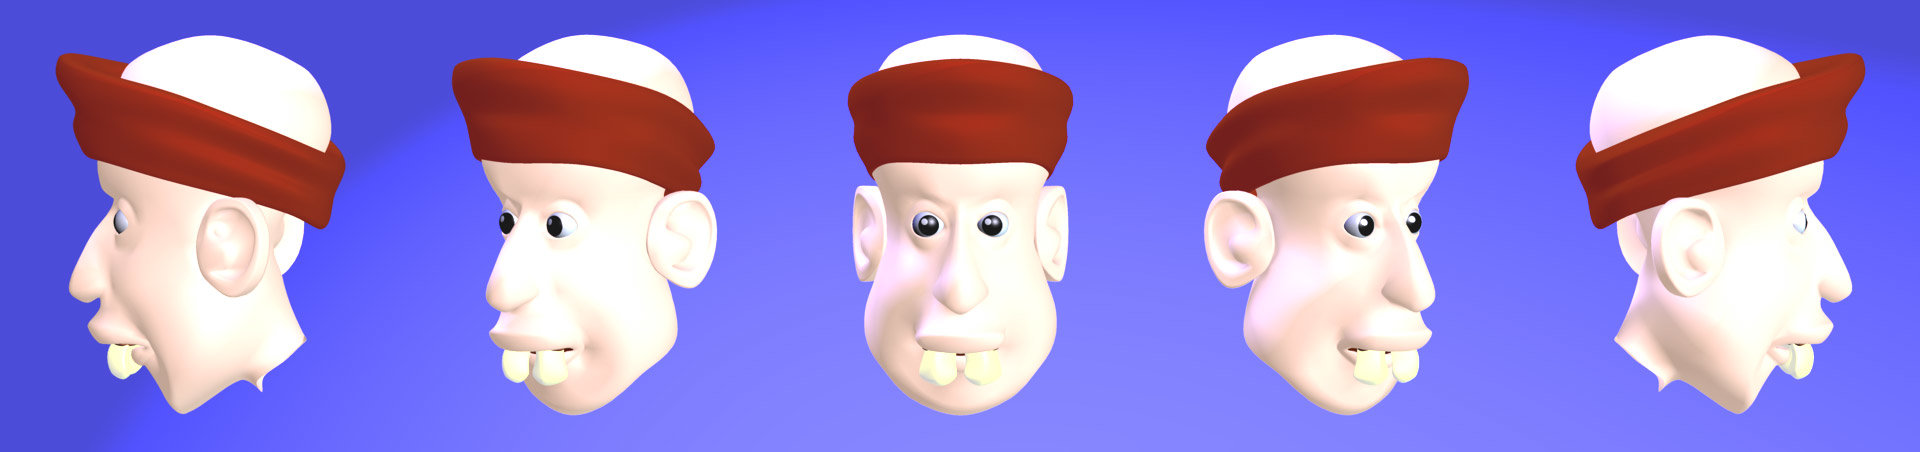 2poco_heads0.jpg